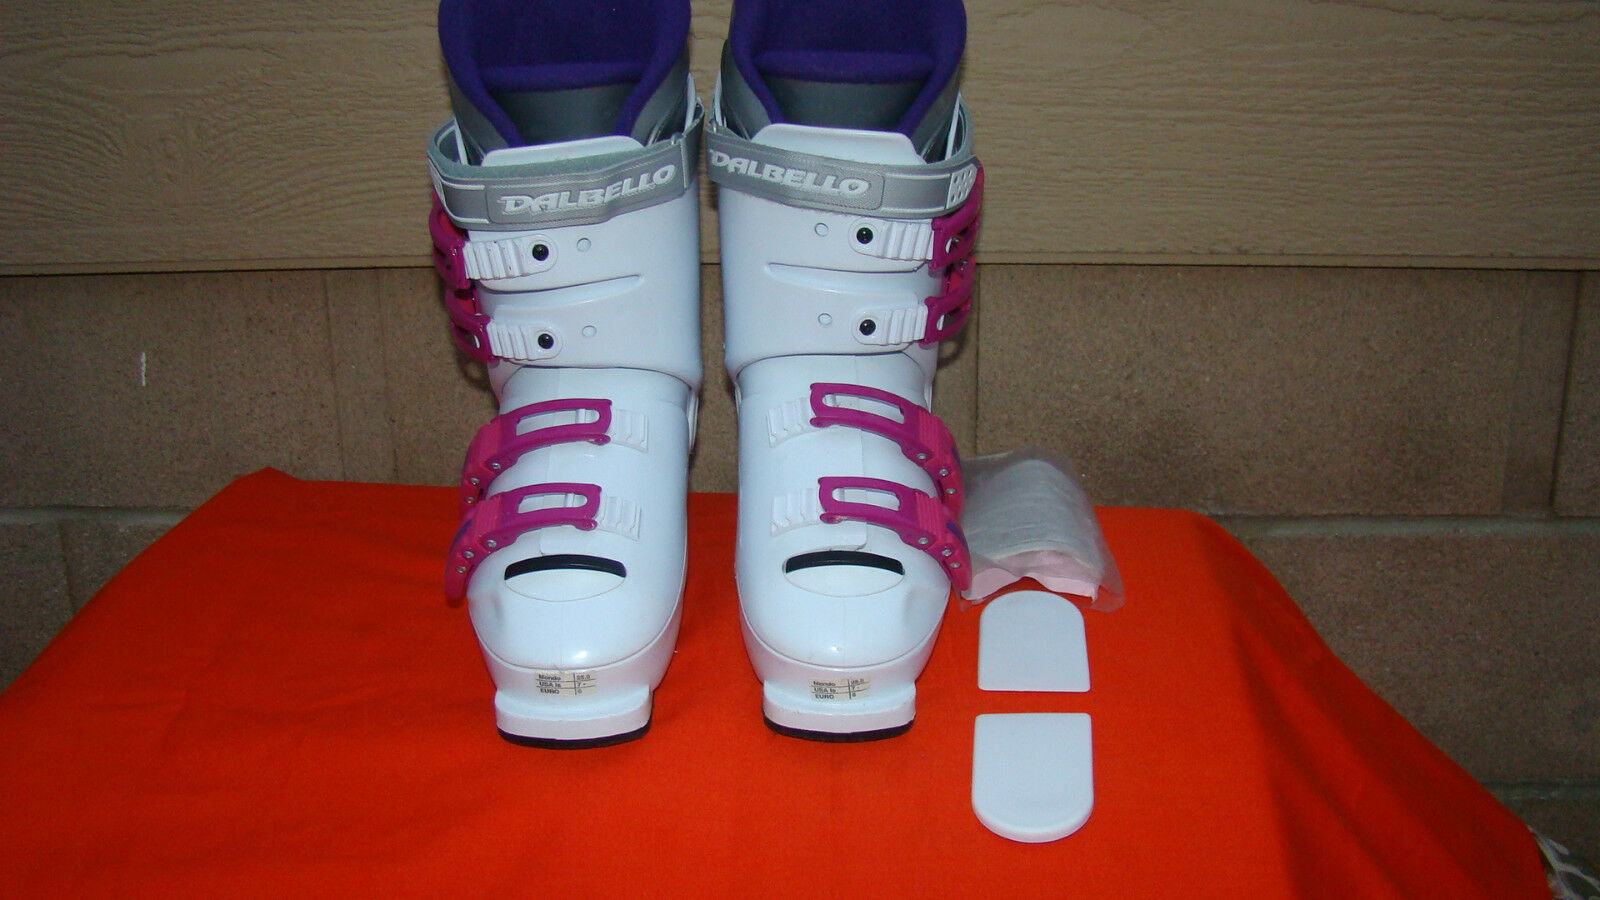 Dalbello Ski Boots MX-39 Womens Us 7 Mondo 250 Eur 6 White Pink